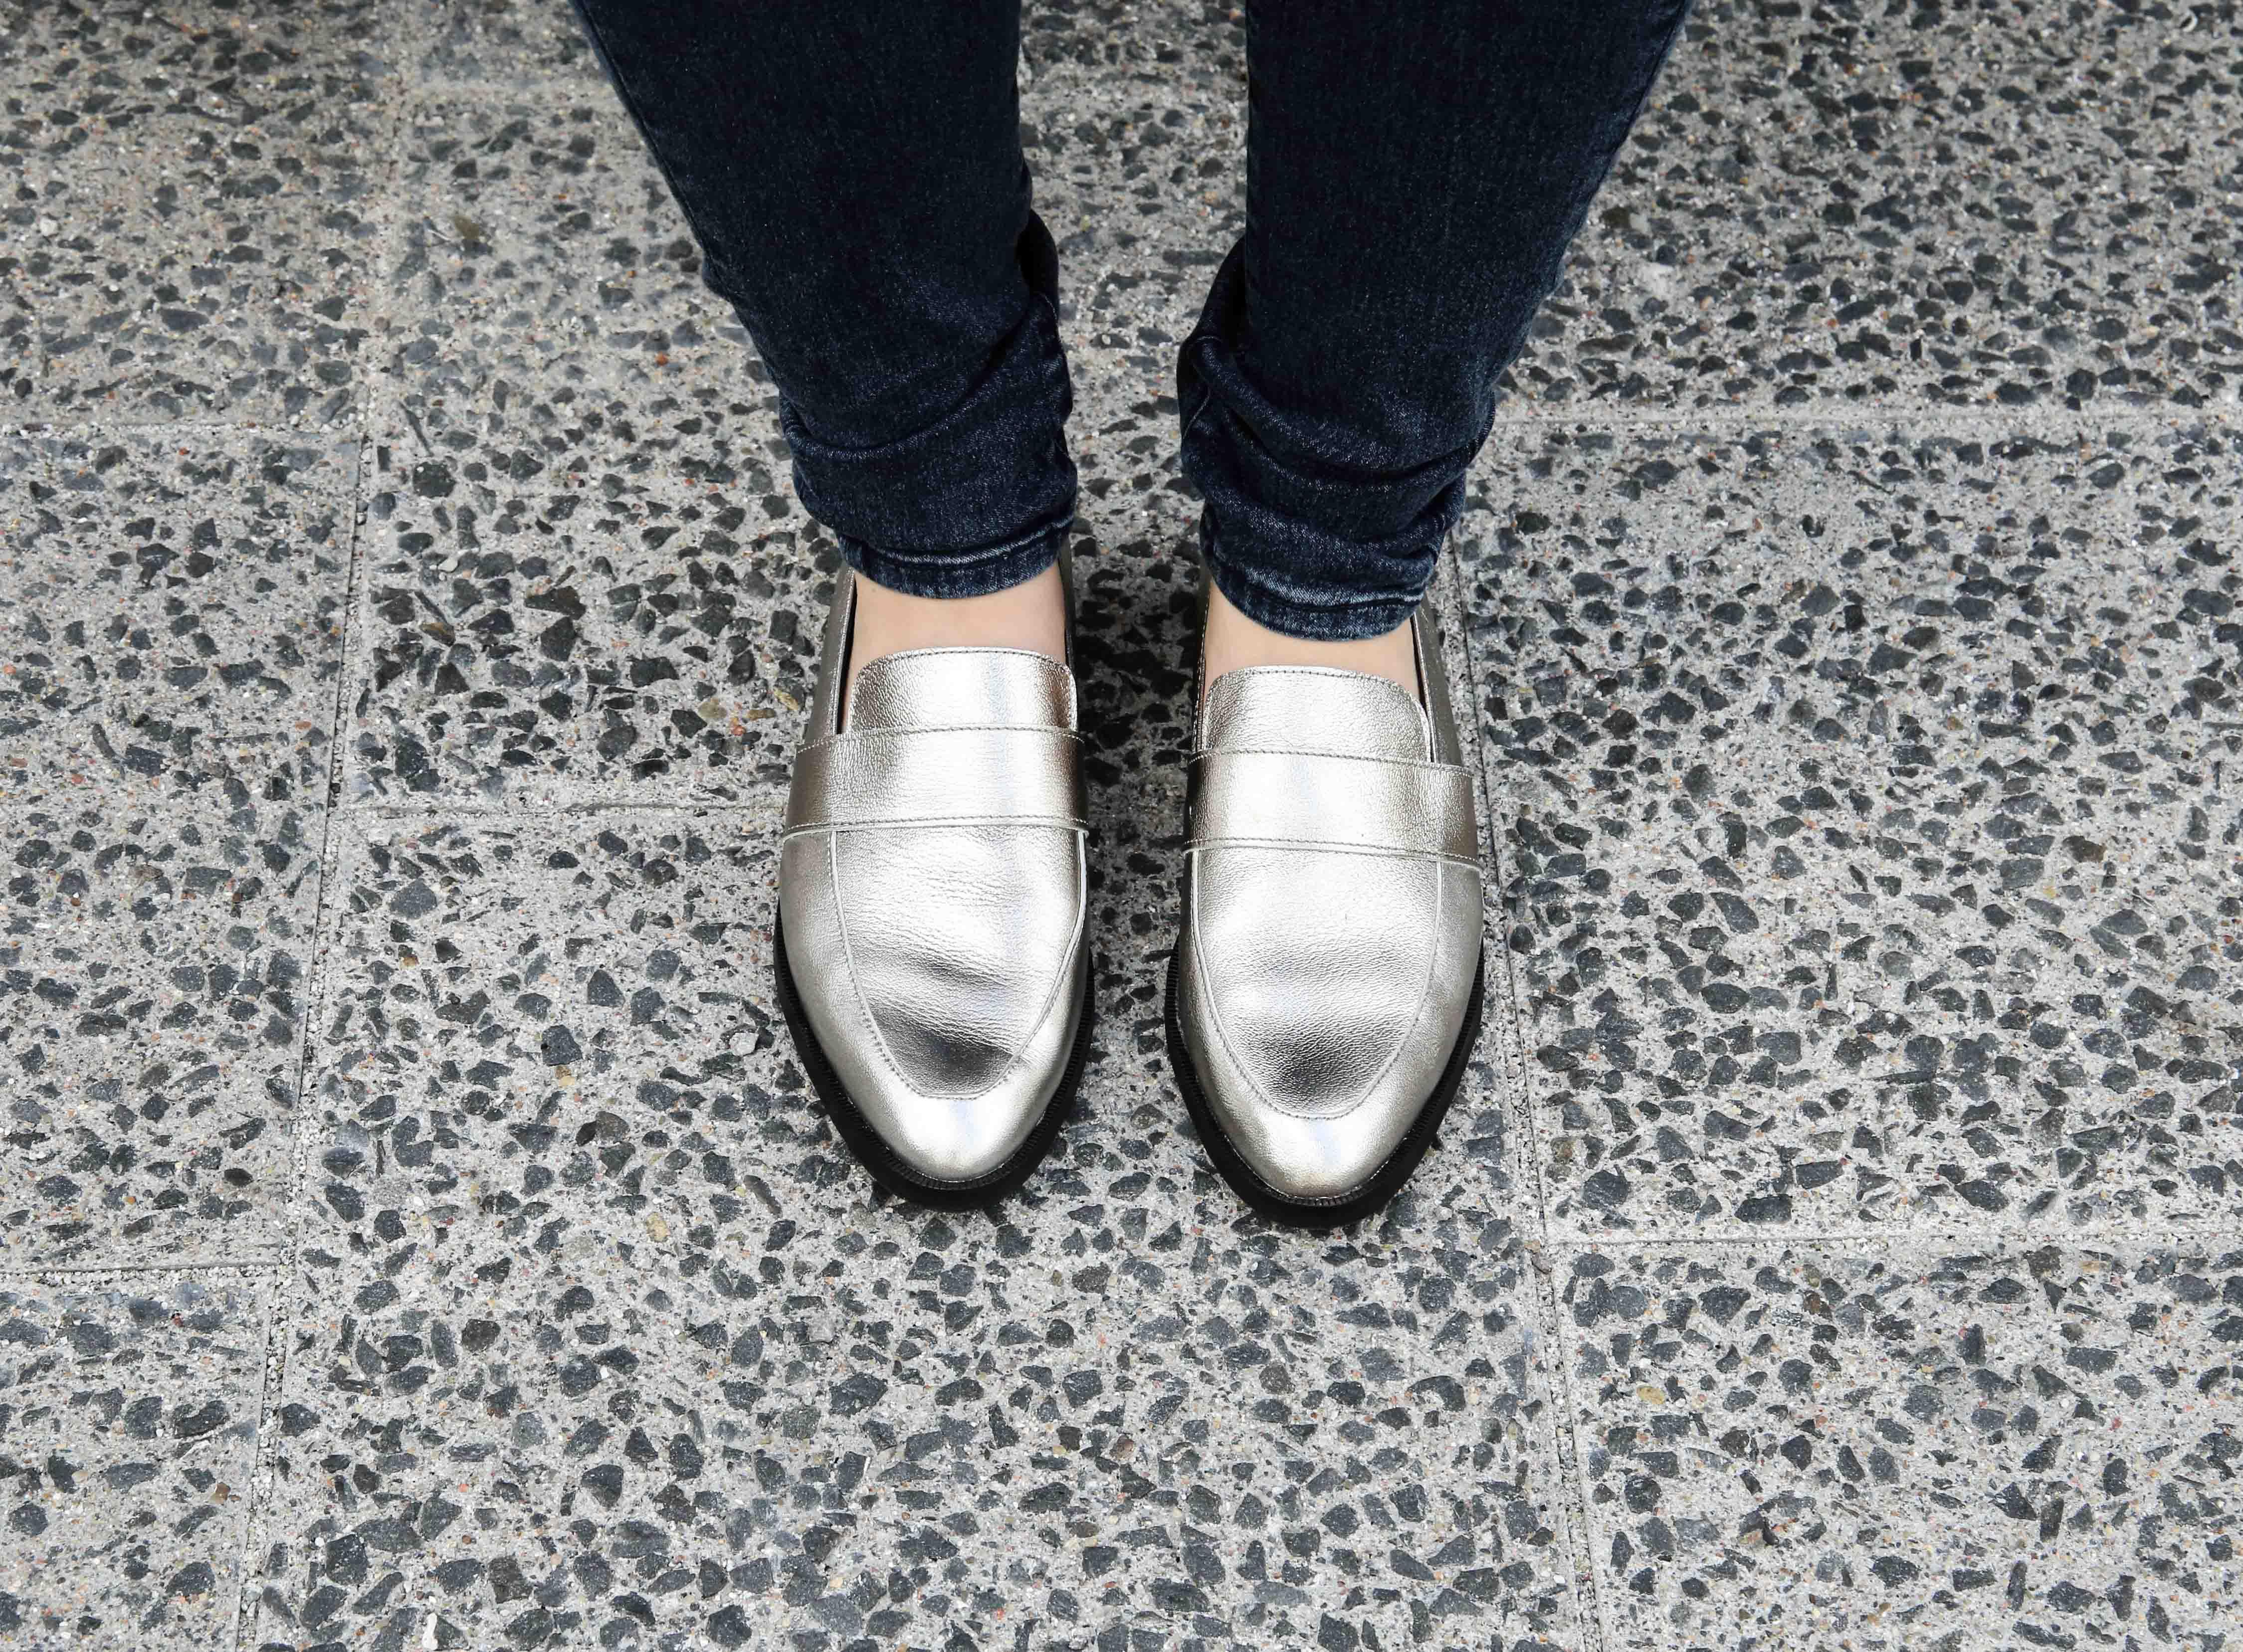 blue-ridge-metallic-slipper-blaue-skinny-jeans-modeblog-fashionblog-outfit-offshoulder-shirt_9961